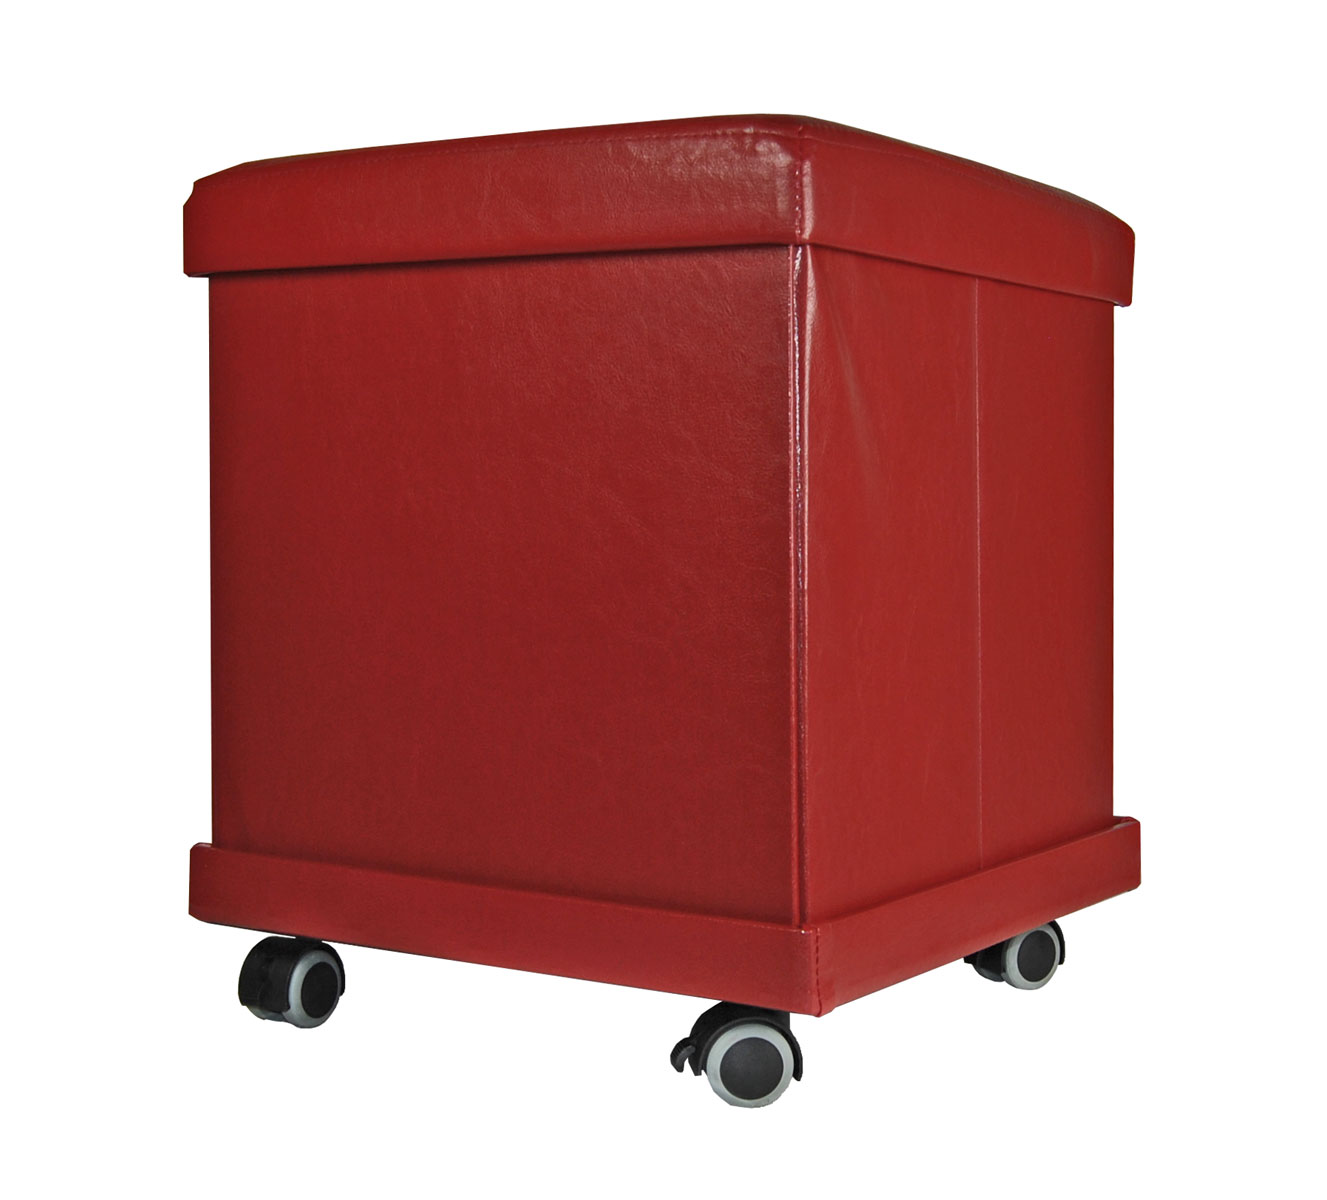 sitzhocker 37x37x43 rollbar sitzhocker hocker sitzw rfel aufbewahrungsbox rollen ebay. Black Bedroom Furniture Sets. Home Design Ideas